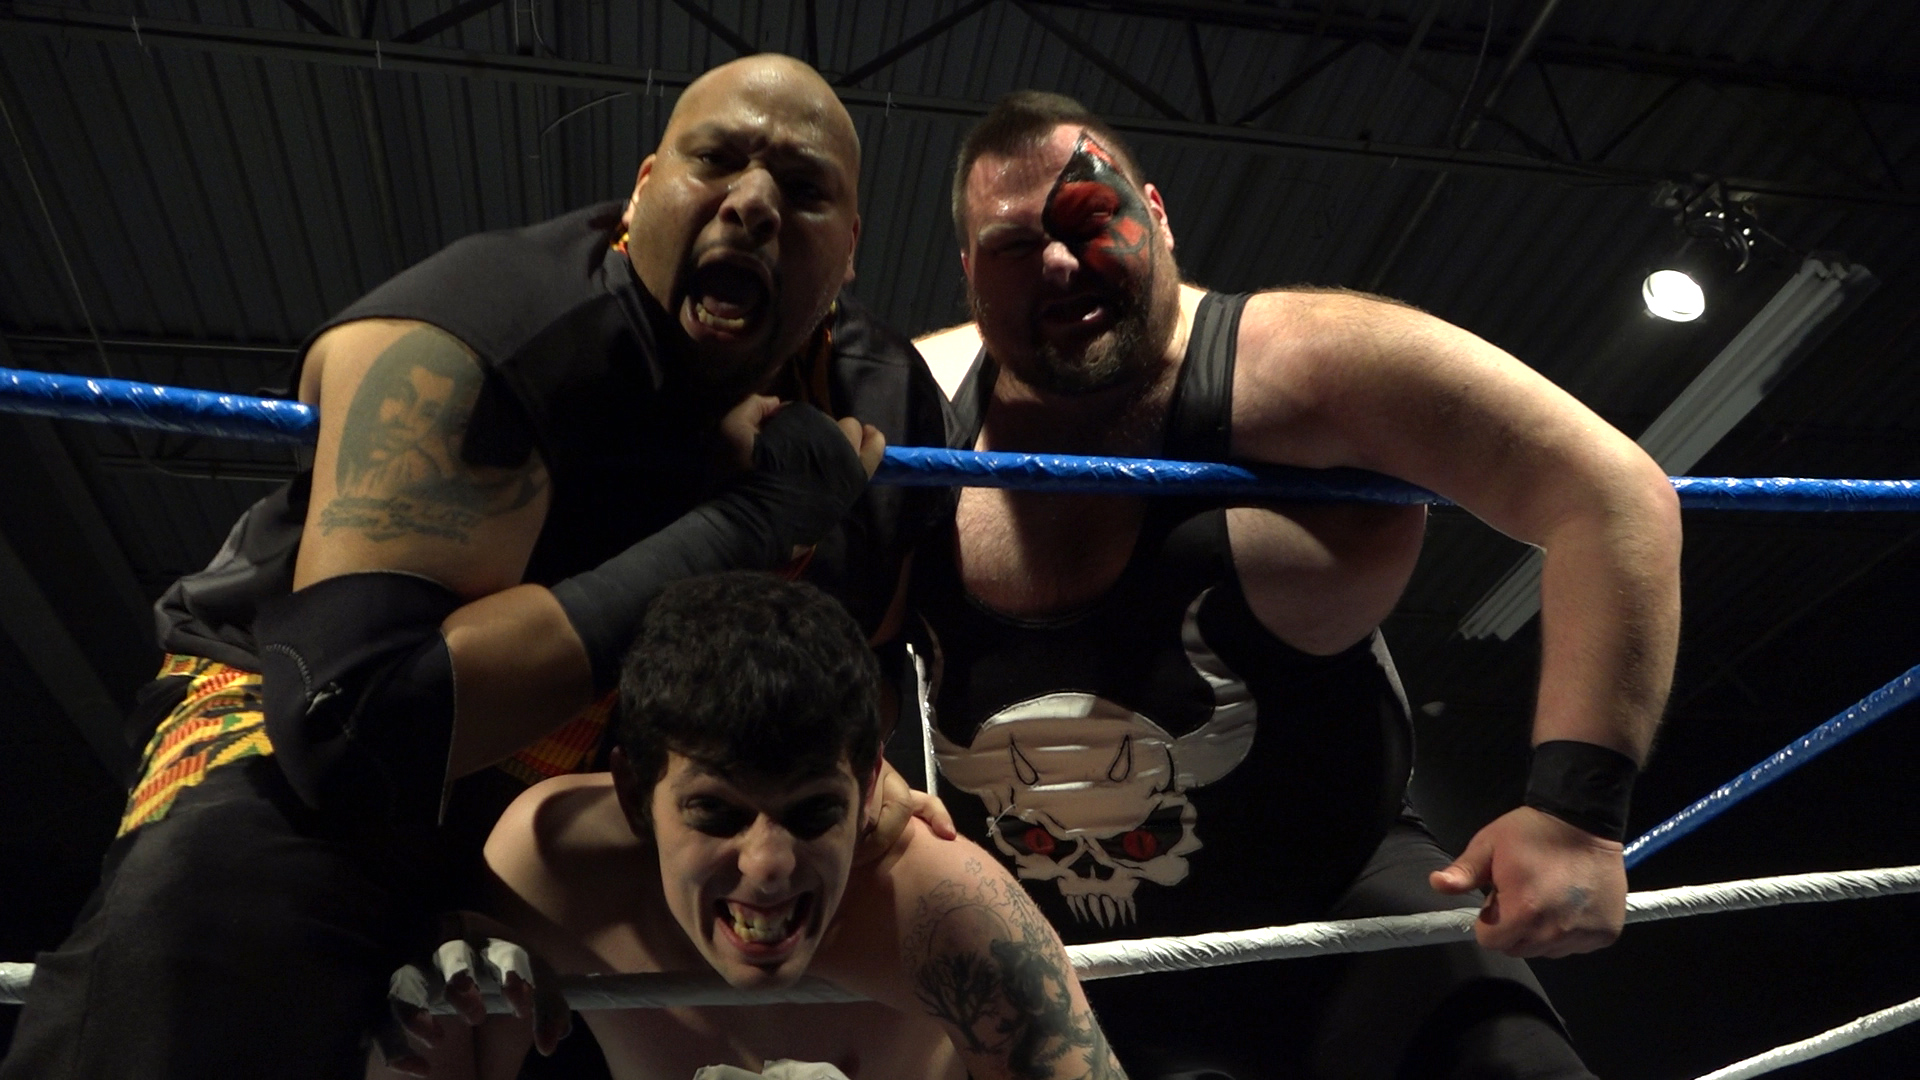 6-Man Tag Team Grudge Match